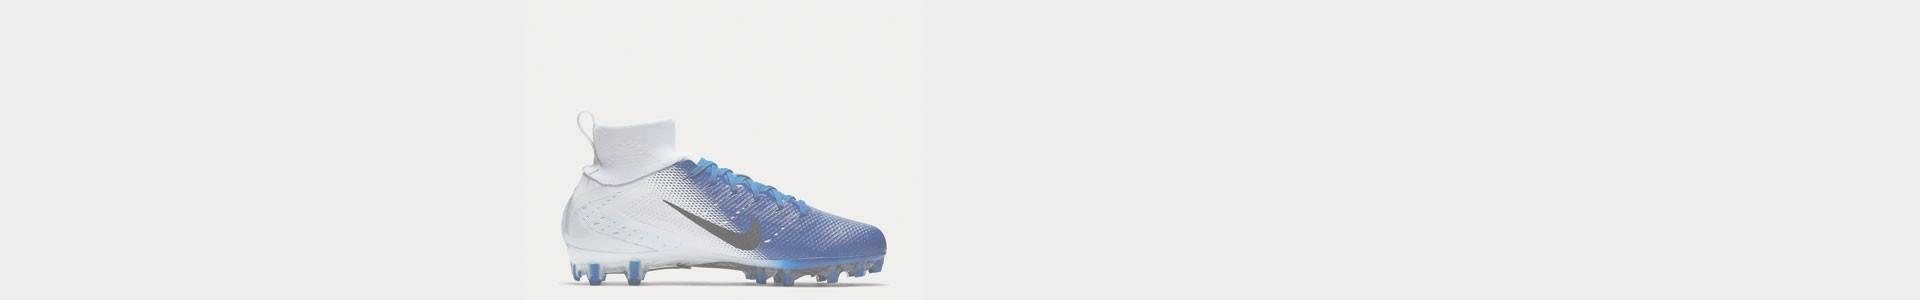 American Football-Schuhe für Männer online | Jetzt bei AnyGivenSunday.Shop